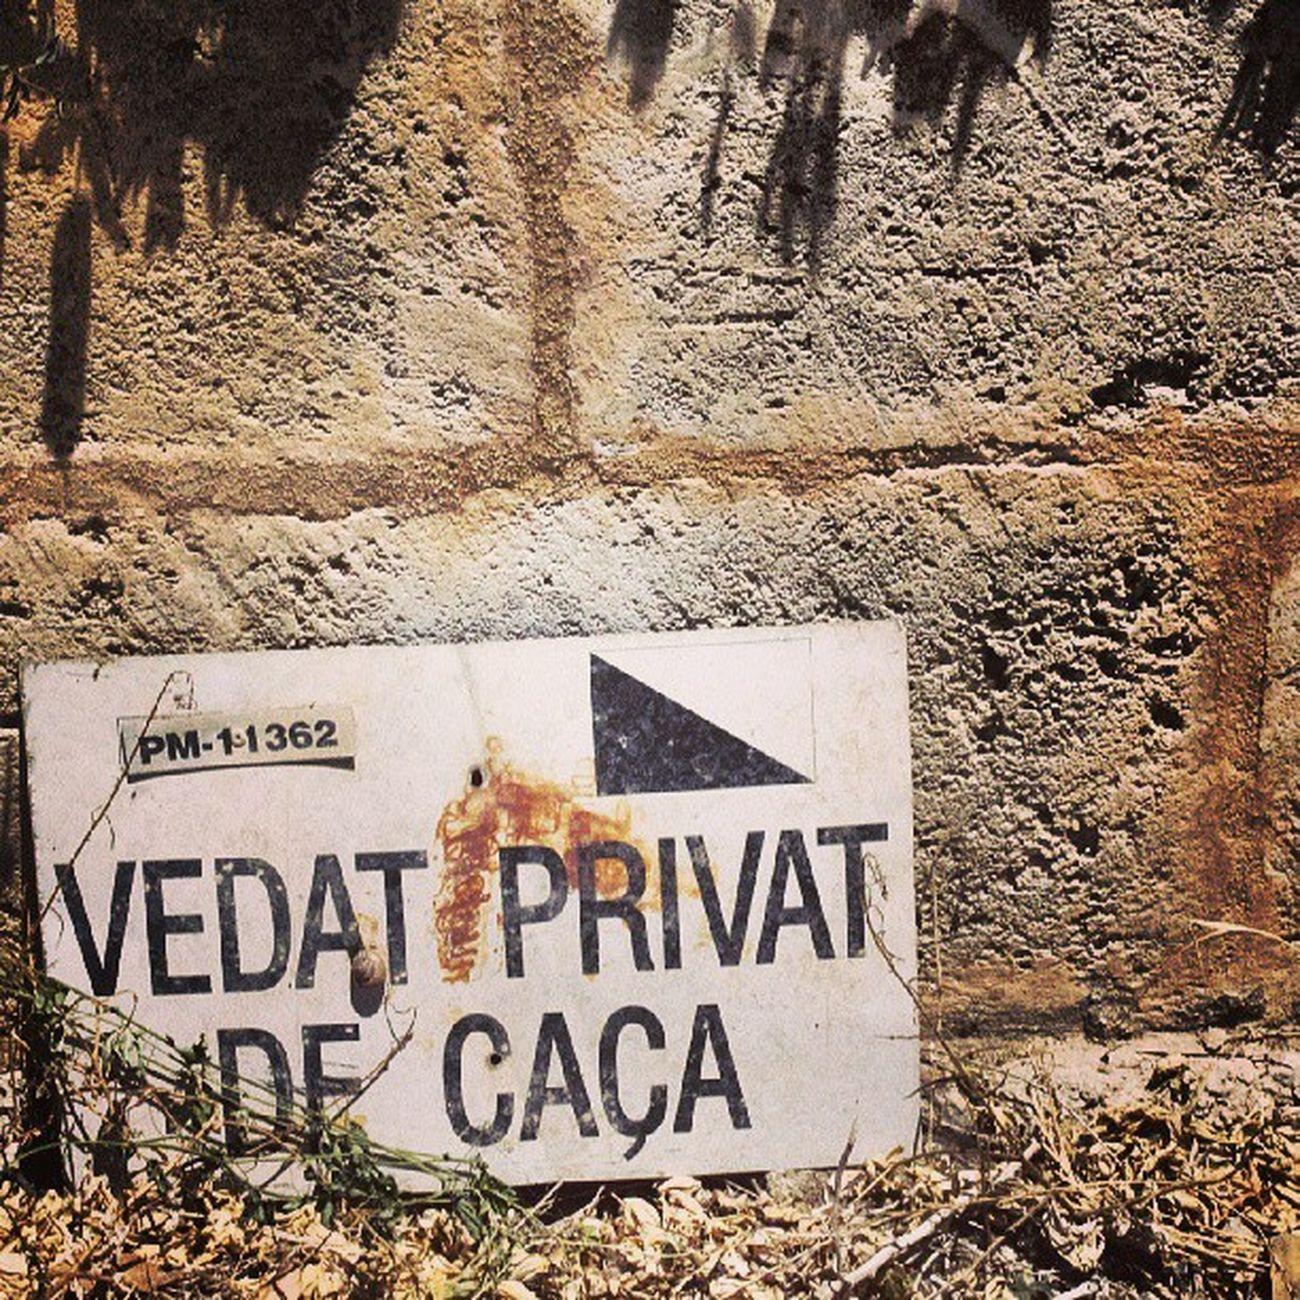 PMI Summer Campo Canon spanien España sommer spain illes balears hunt Jagd caza Mallorca majorca 2013 bestoftheday tbt tweegram